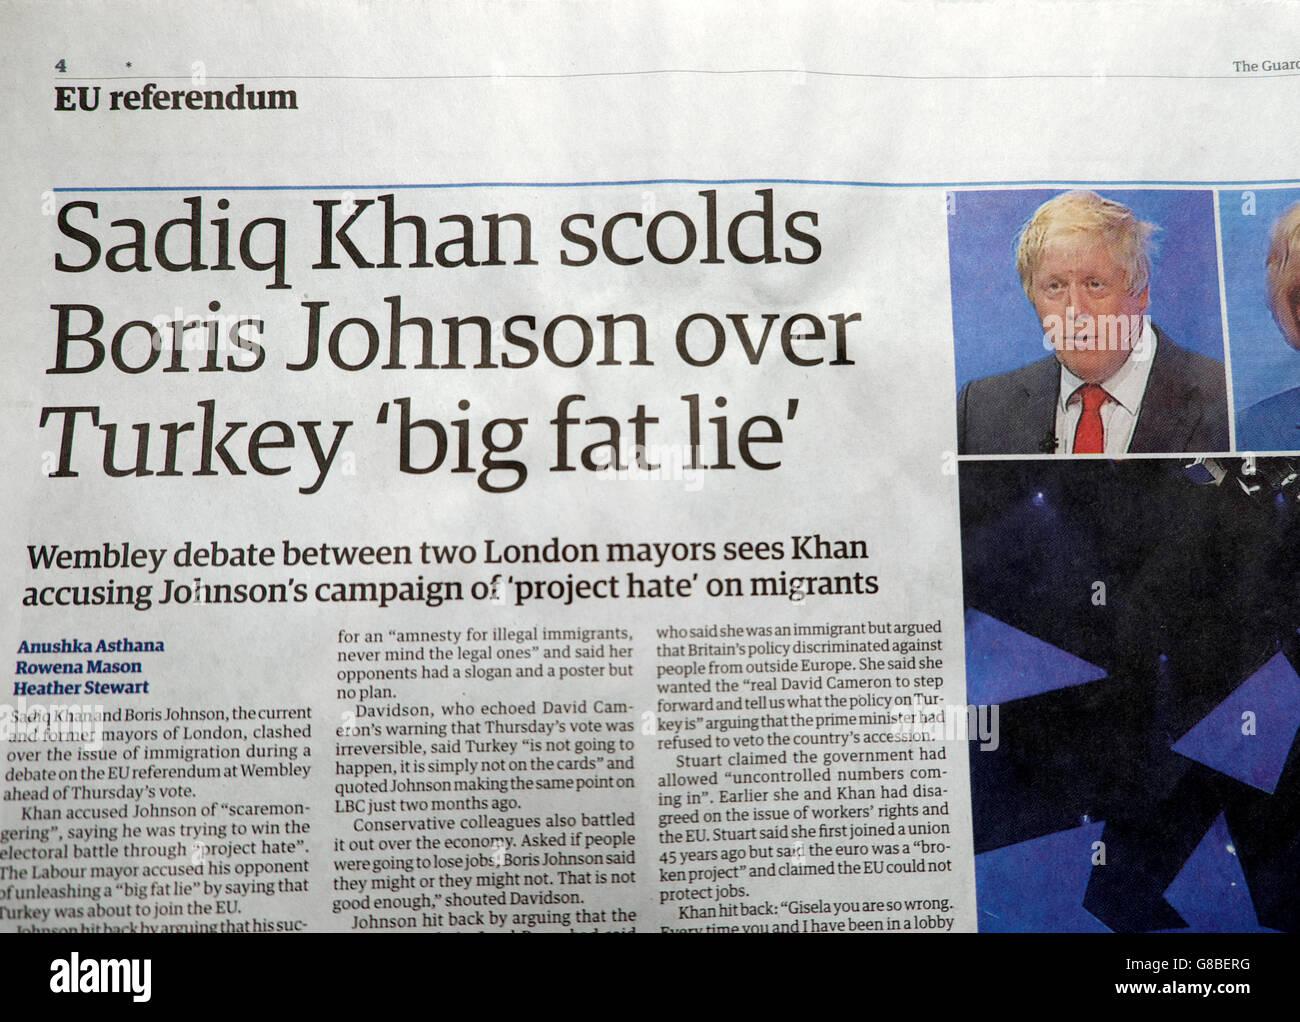 Sadiq Khan scolds Boris Johnson over Turkey 'big fat lie' article in the EU referendum Guardian newspaper 22nd June Stock Photo